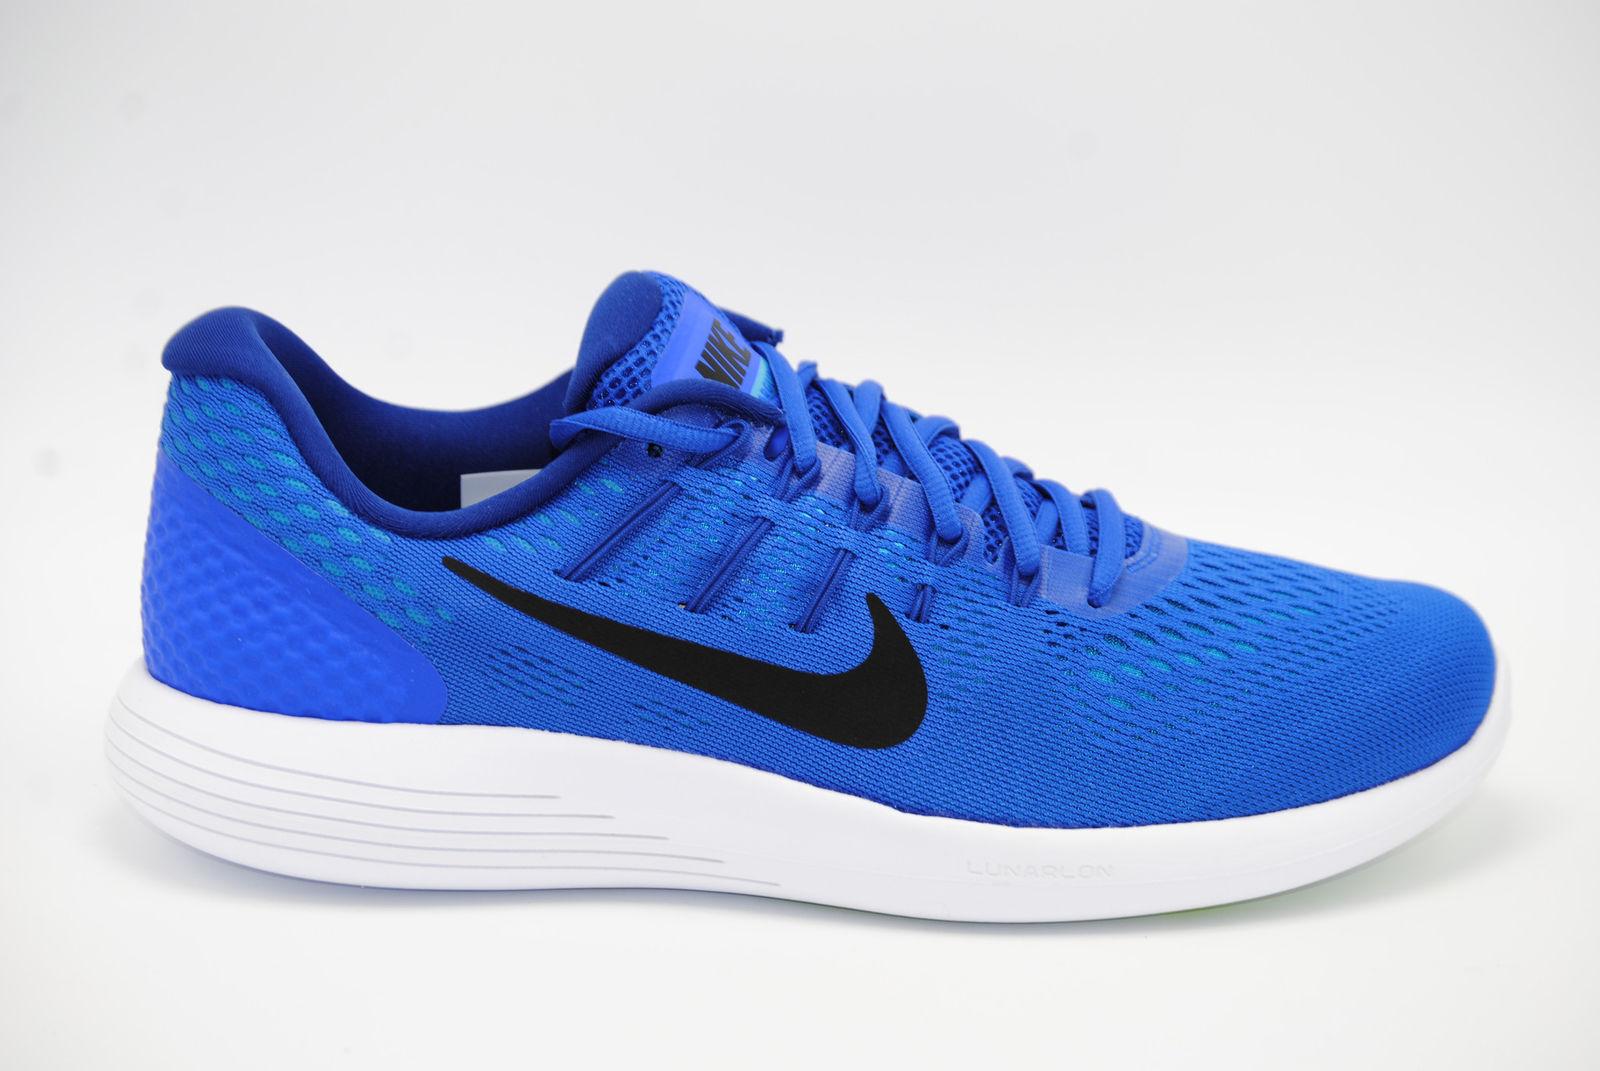 Nike Nike Nike lunarglide 8 laufschuhe racer blau / schwarz aa8676 400  im 120,00 d2b7fa